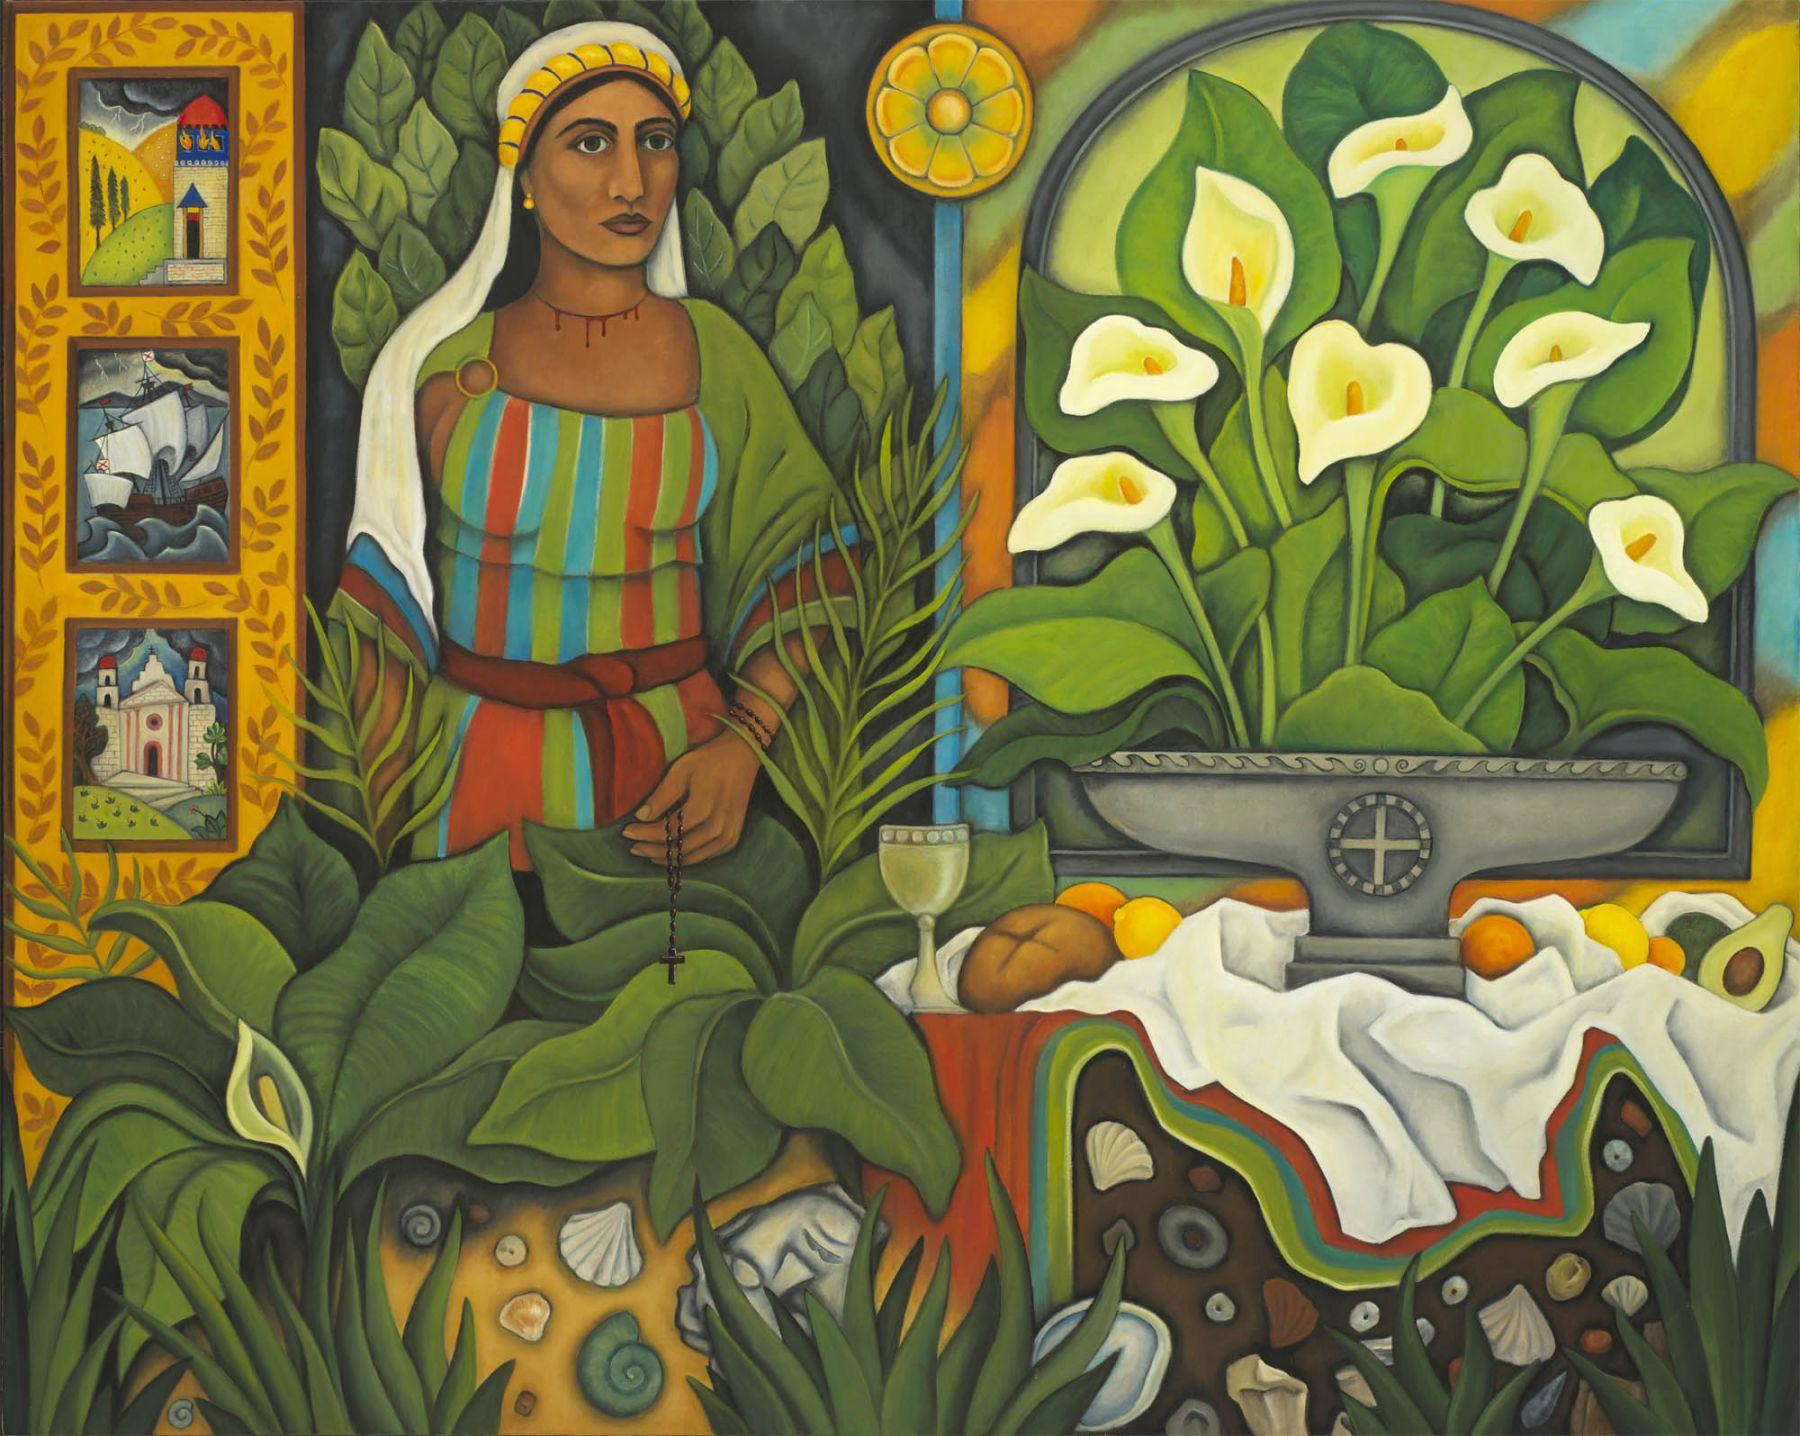 Angela Perko, Feast Day (or the Enduring Qua